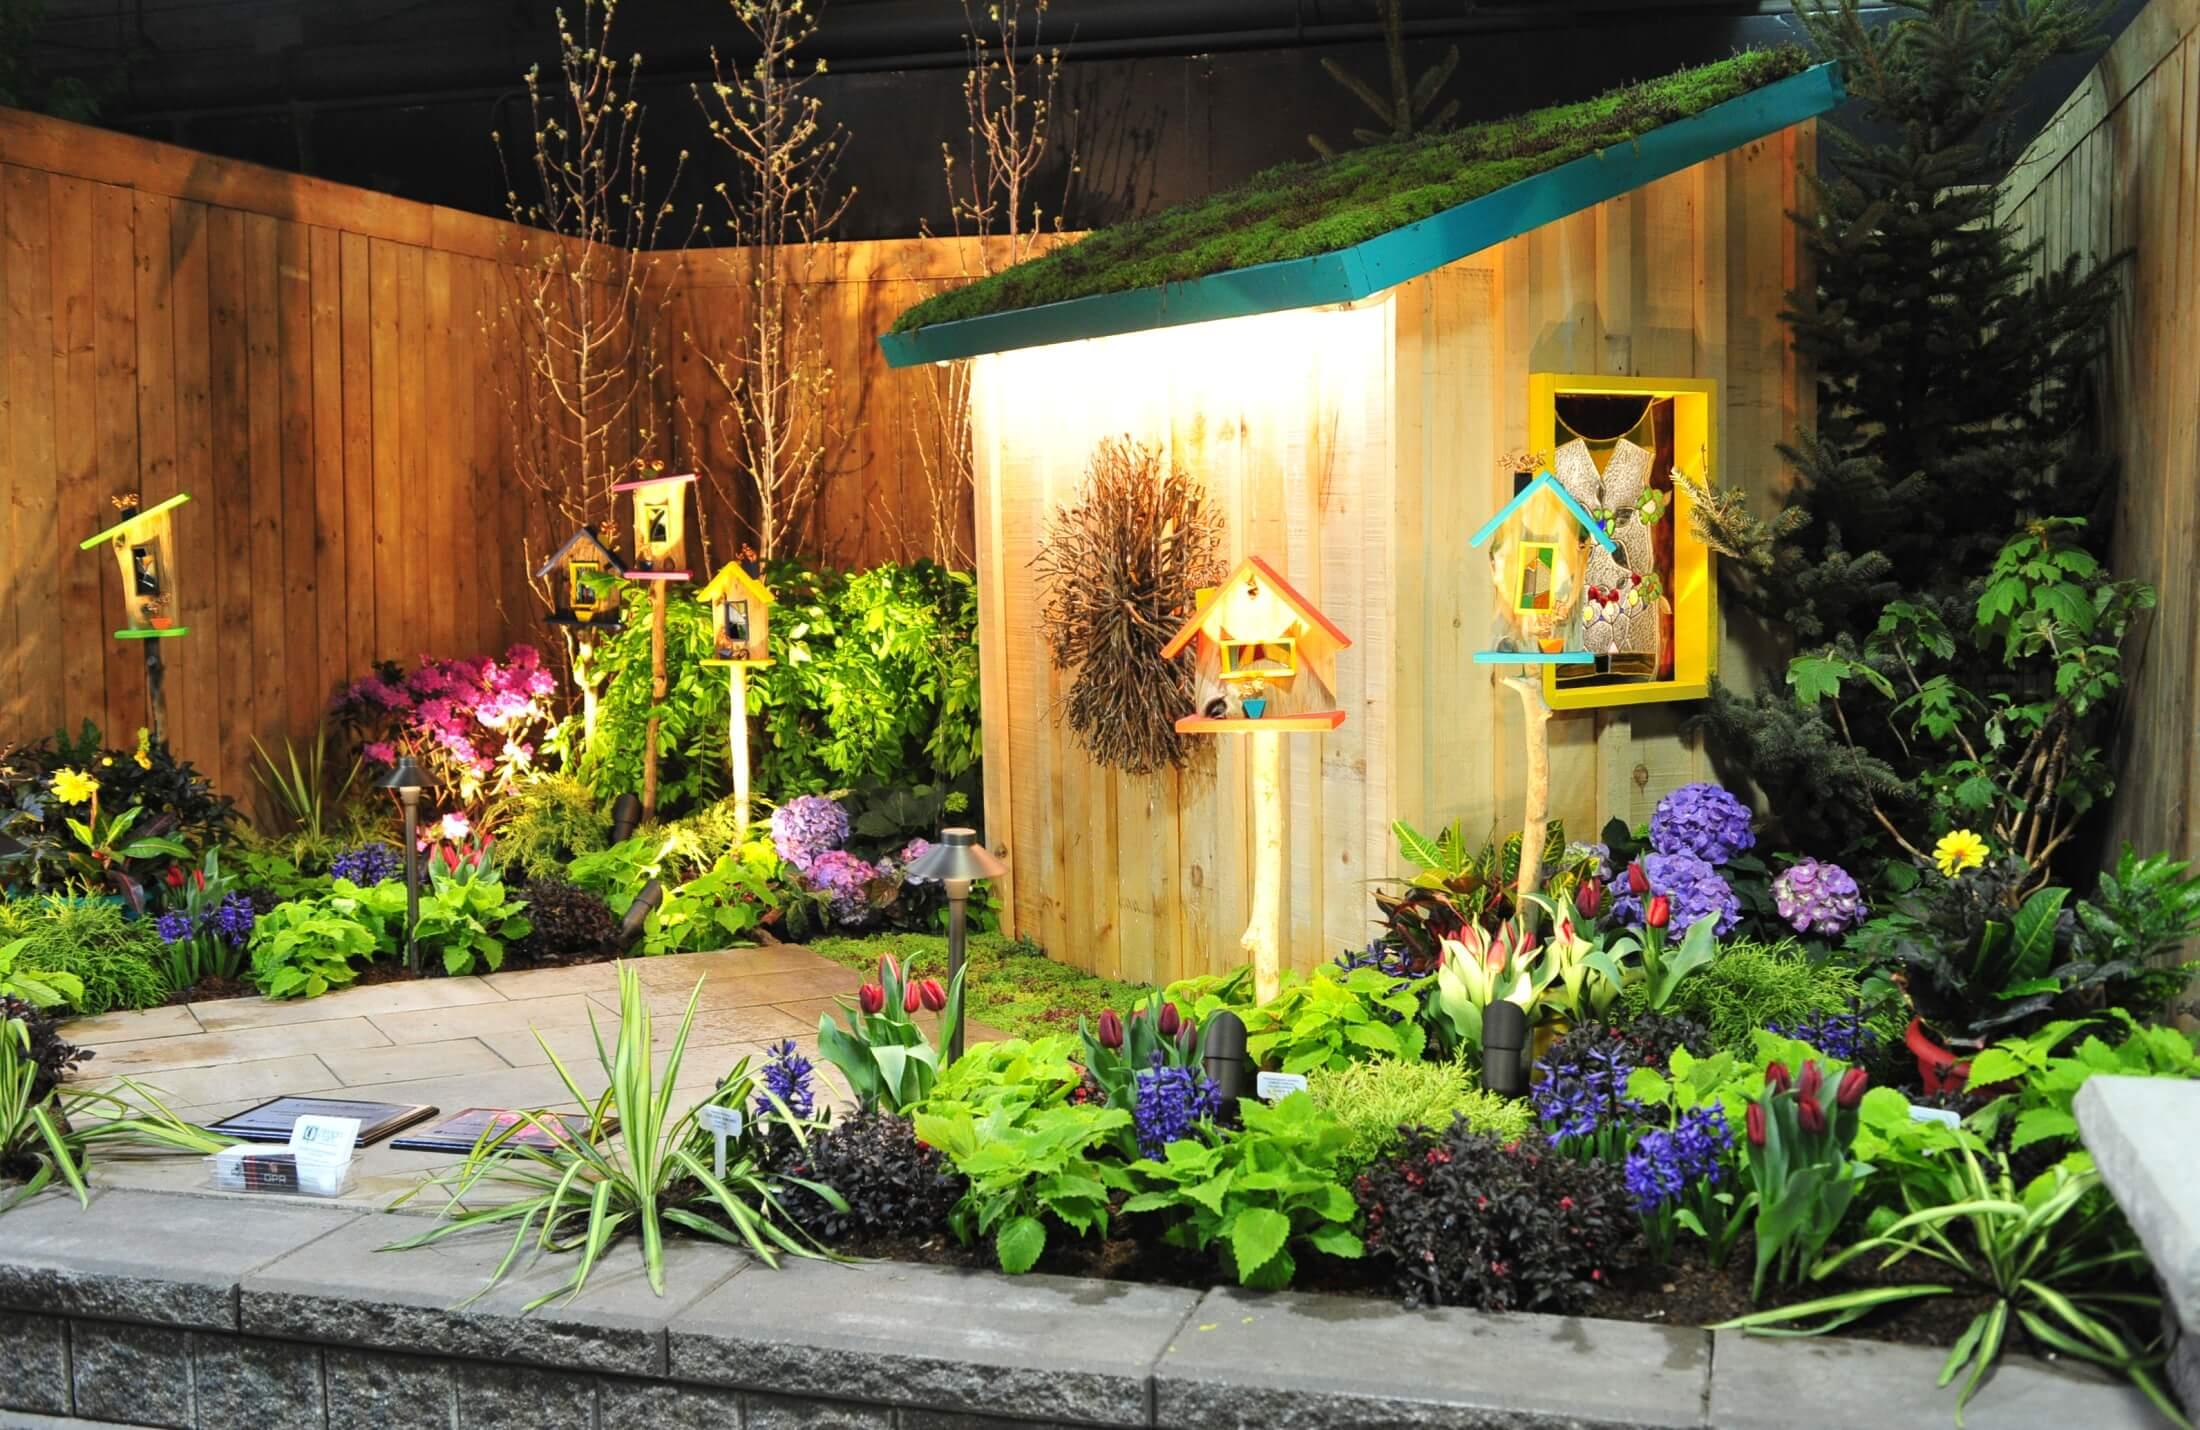 Canada Blooms 2019 Feature Garden Builder Awards ...